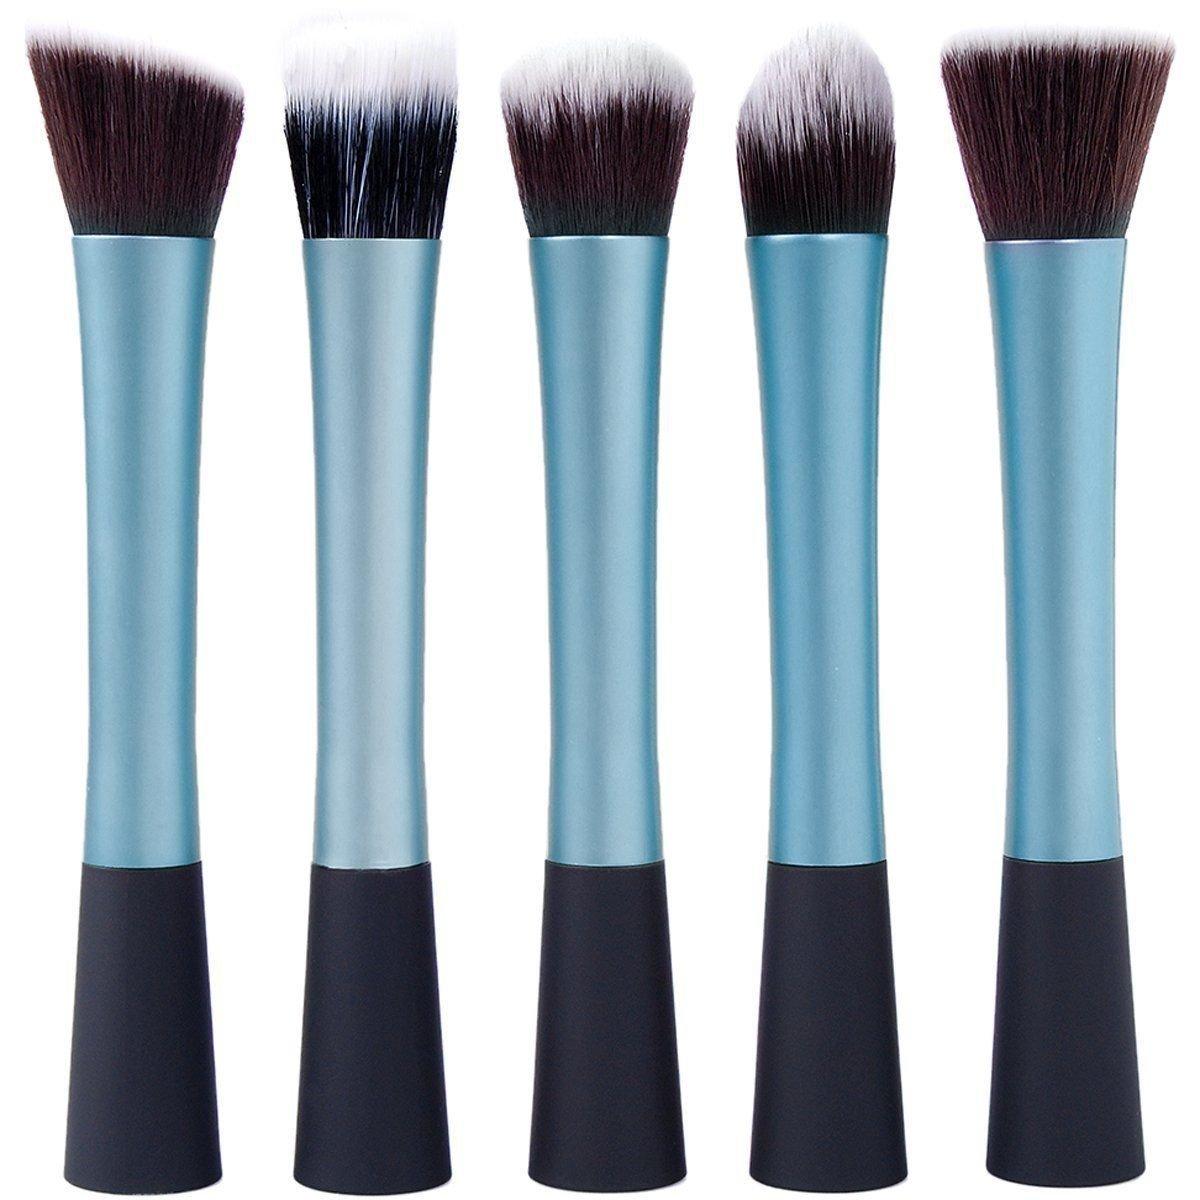 LyDia Professional Rose-Gold/Gold/Silver/Blue/Red-Pink/Black-Gold/Purple Powder/Foundation/Eyeshadow/Contour/Pointed Crease/Eyeliner/Blush Makeup Brush Set (5pcs Blue Set) by LyDia